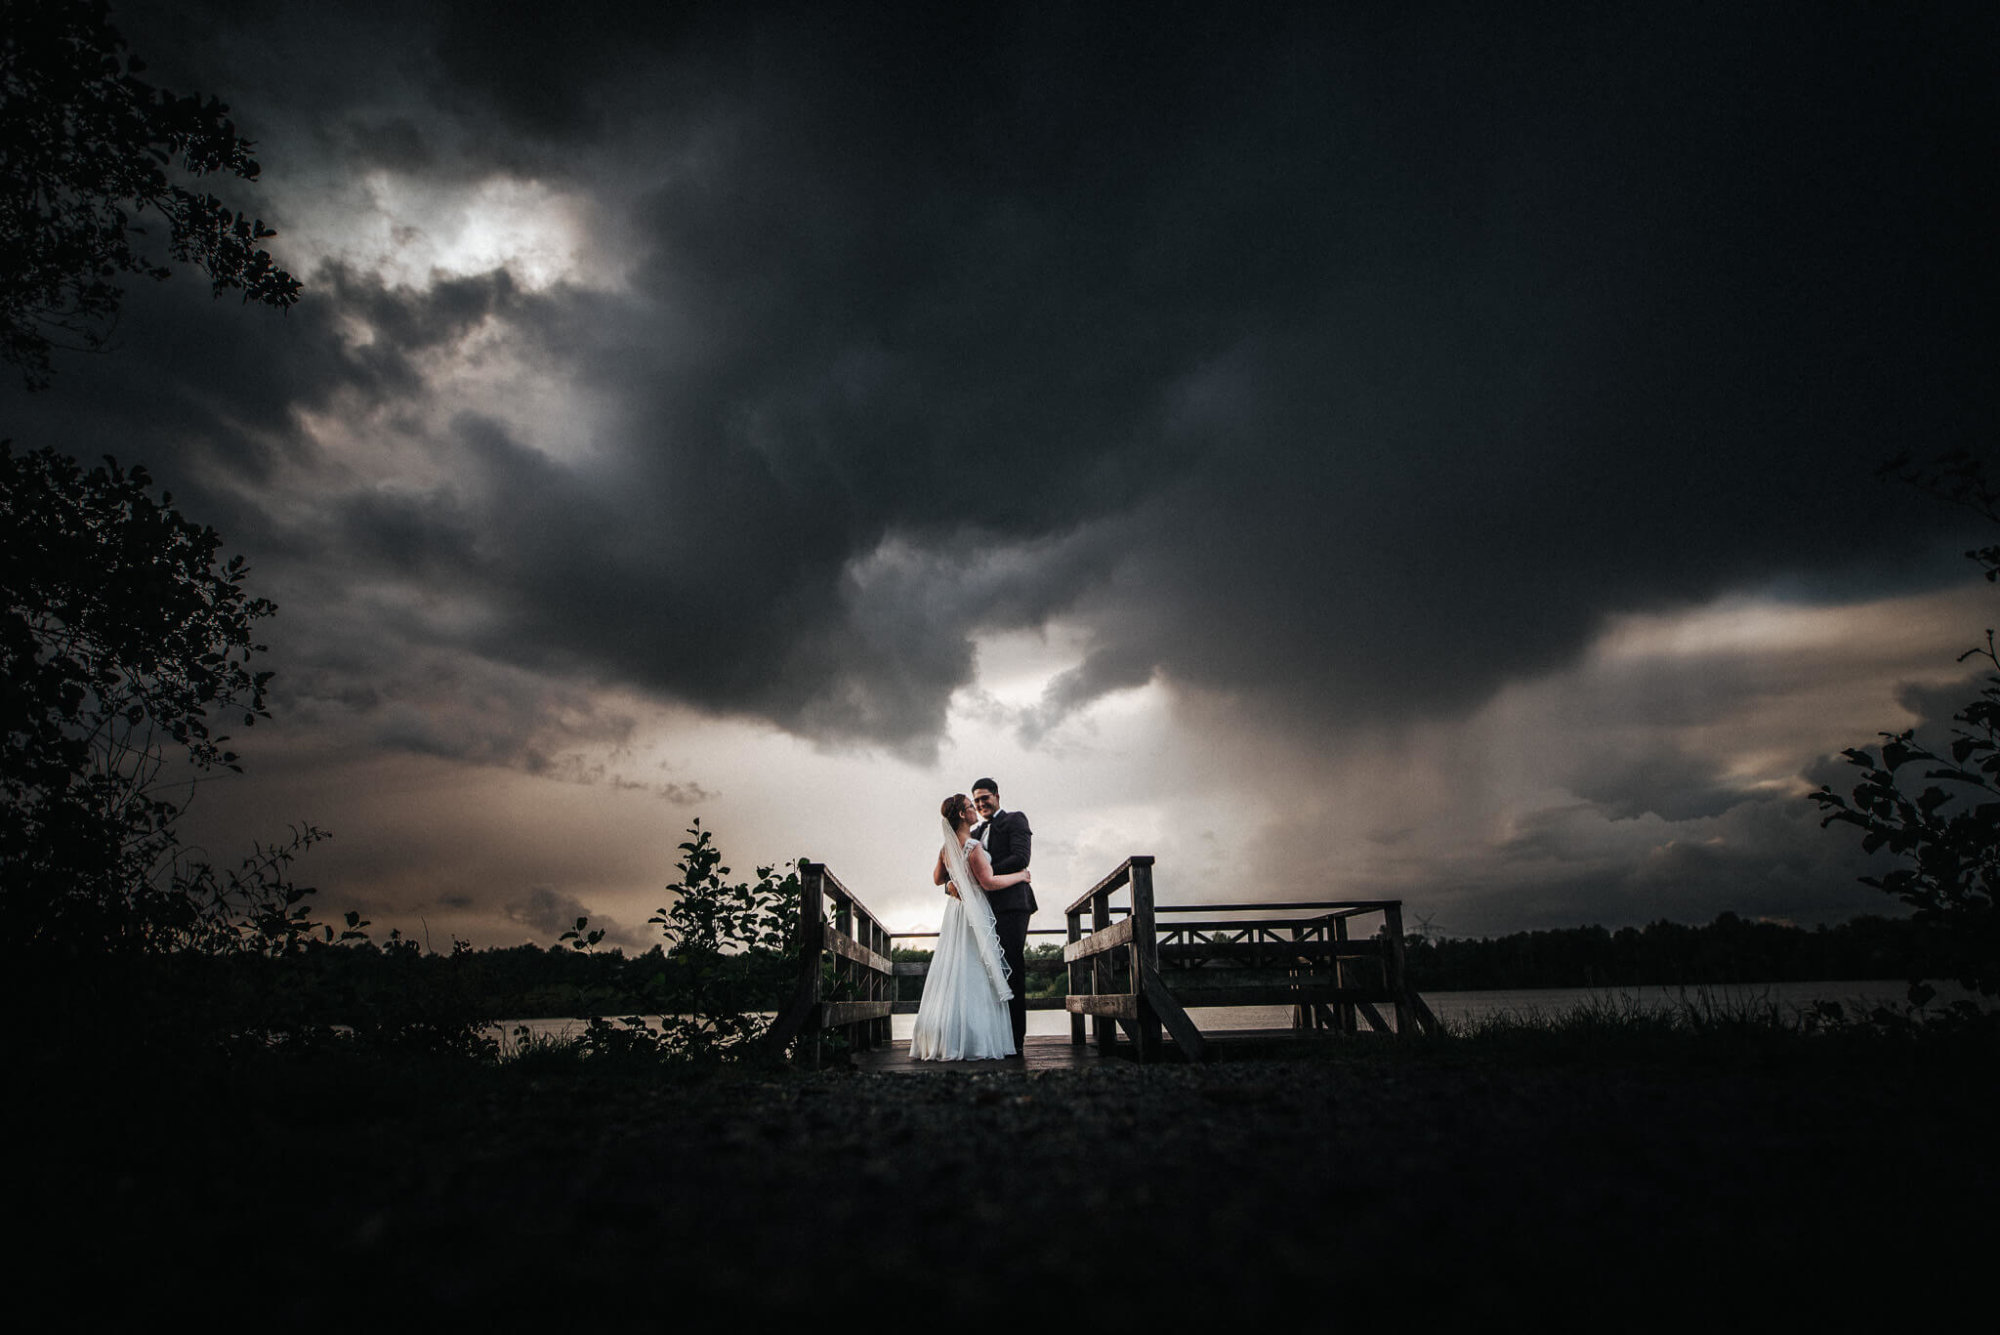 Brautpaar nach Regen am Abend am Steg bei Cuxhaven